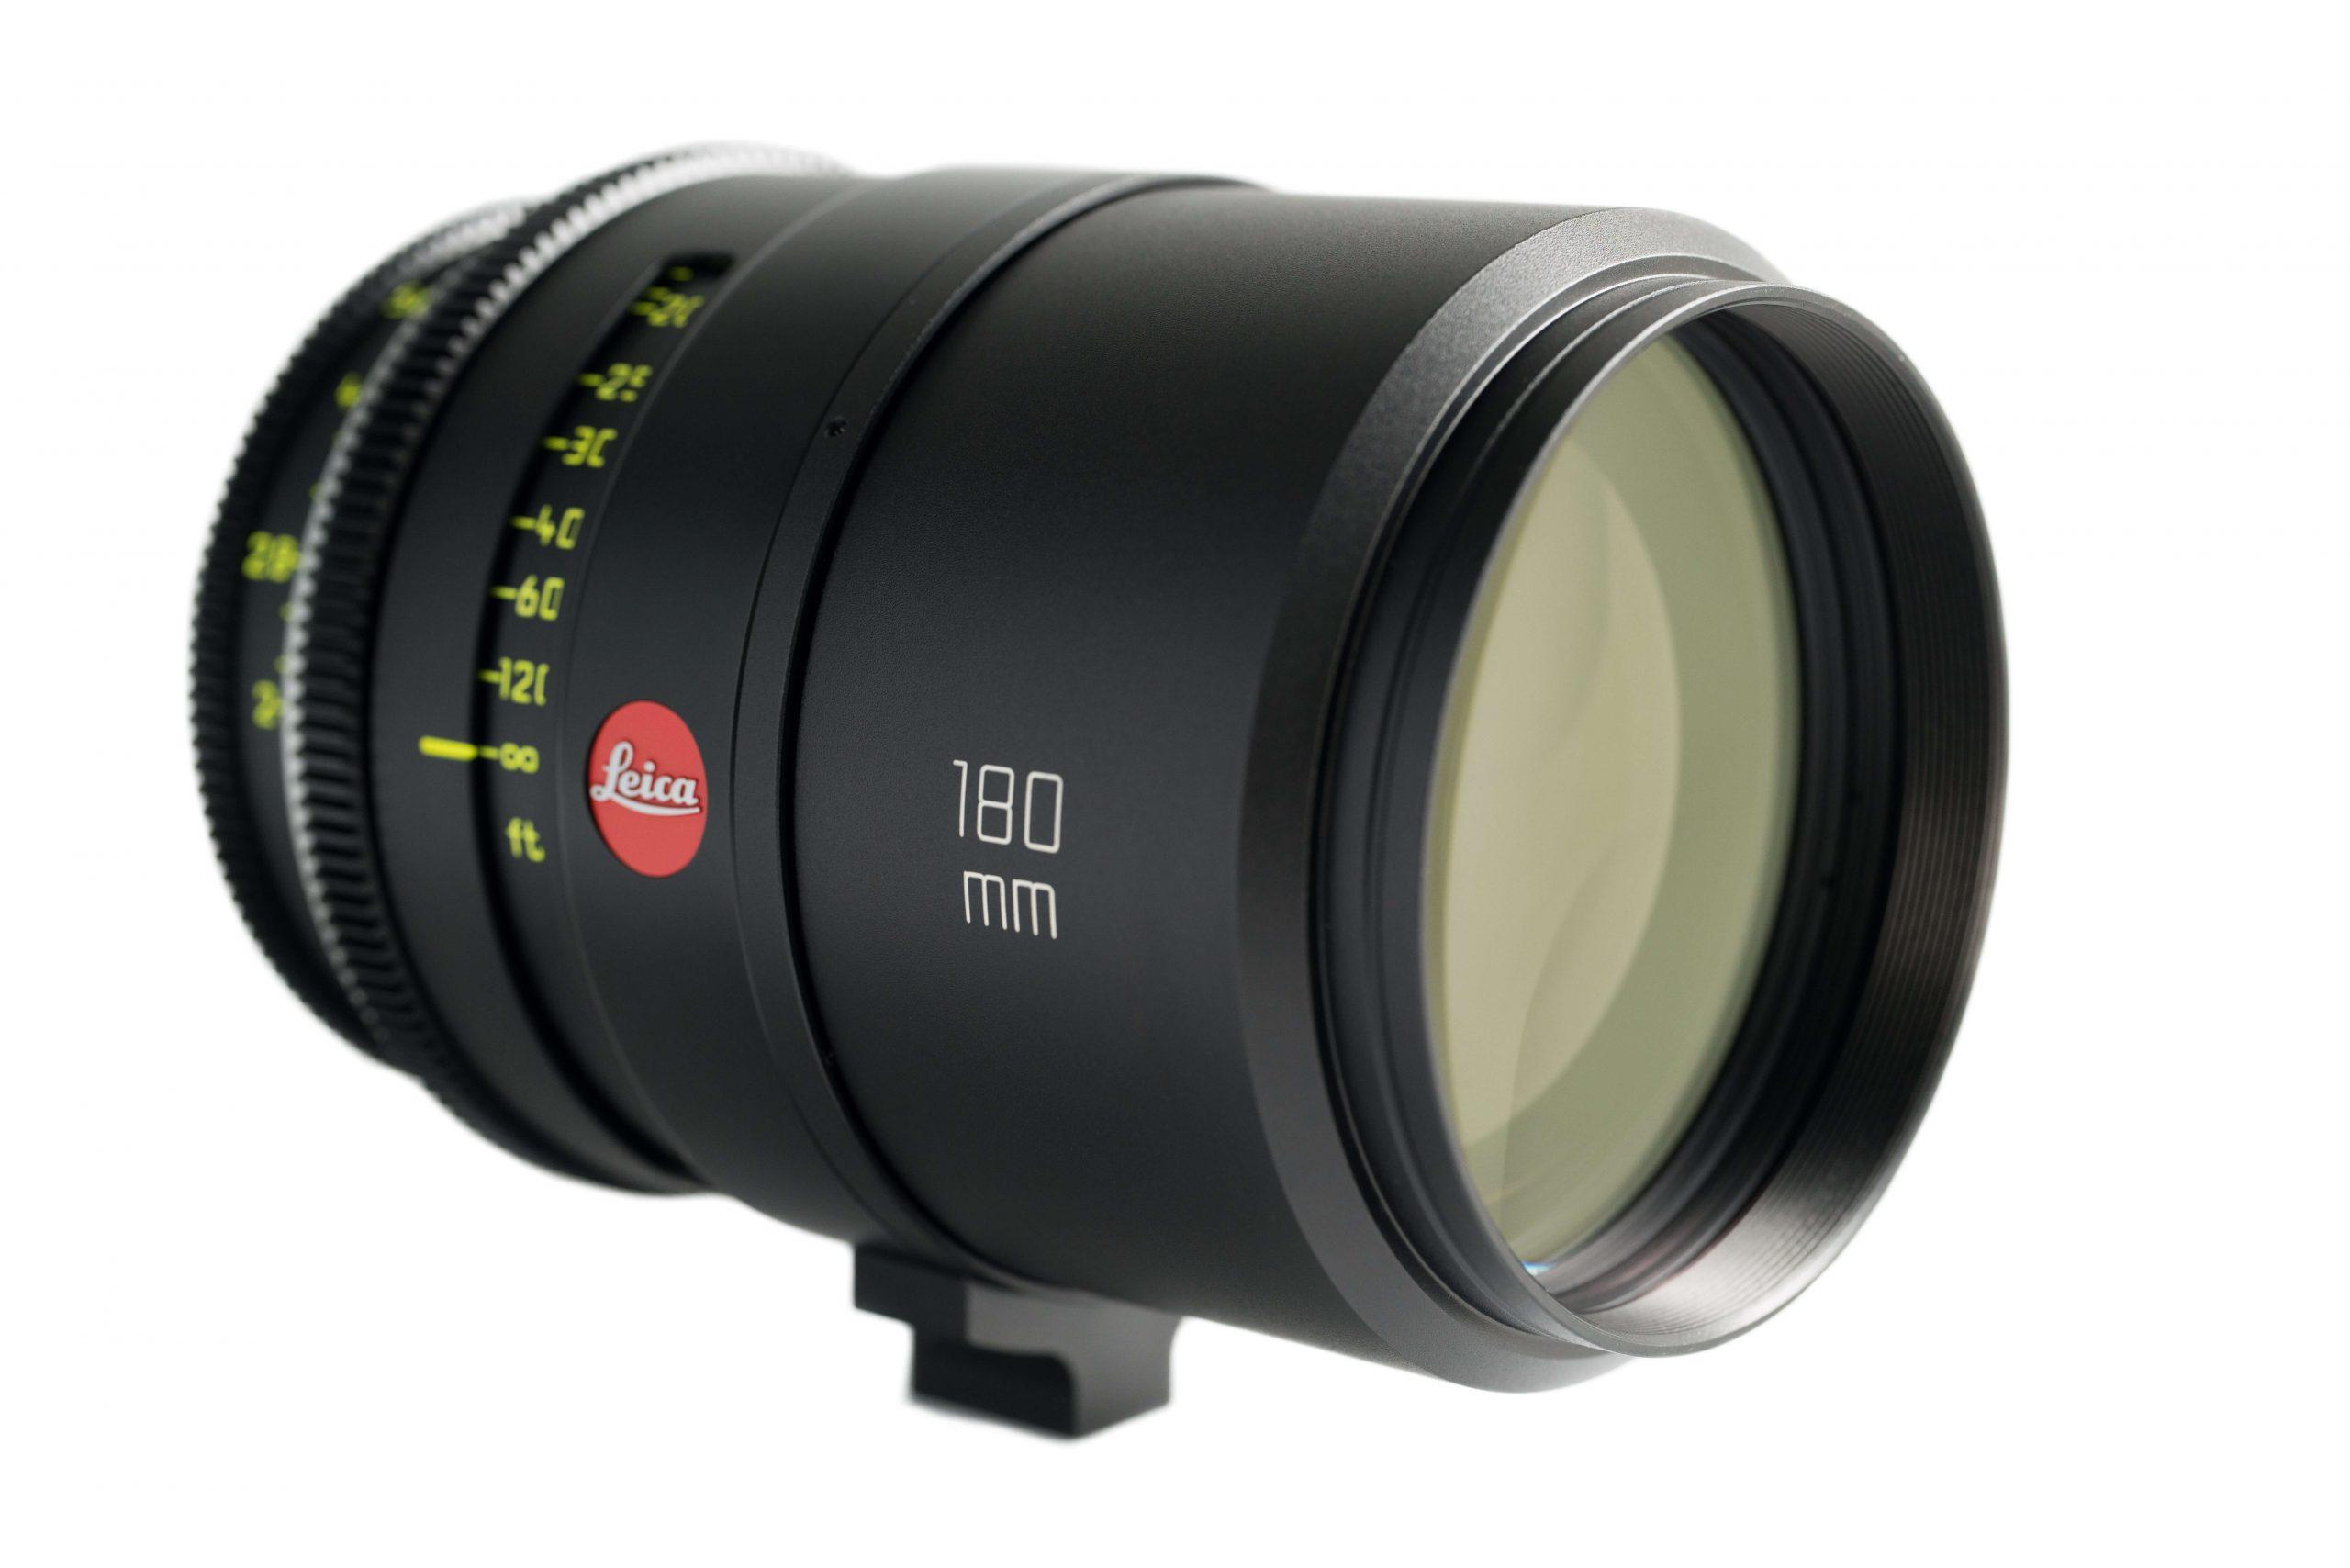 180mm Leica Cine T2 side view